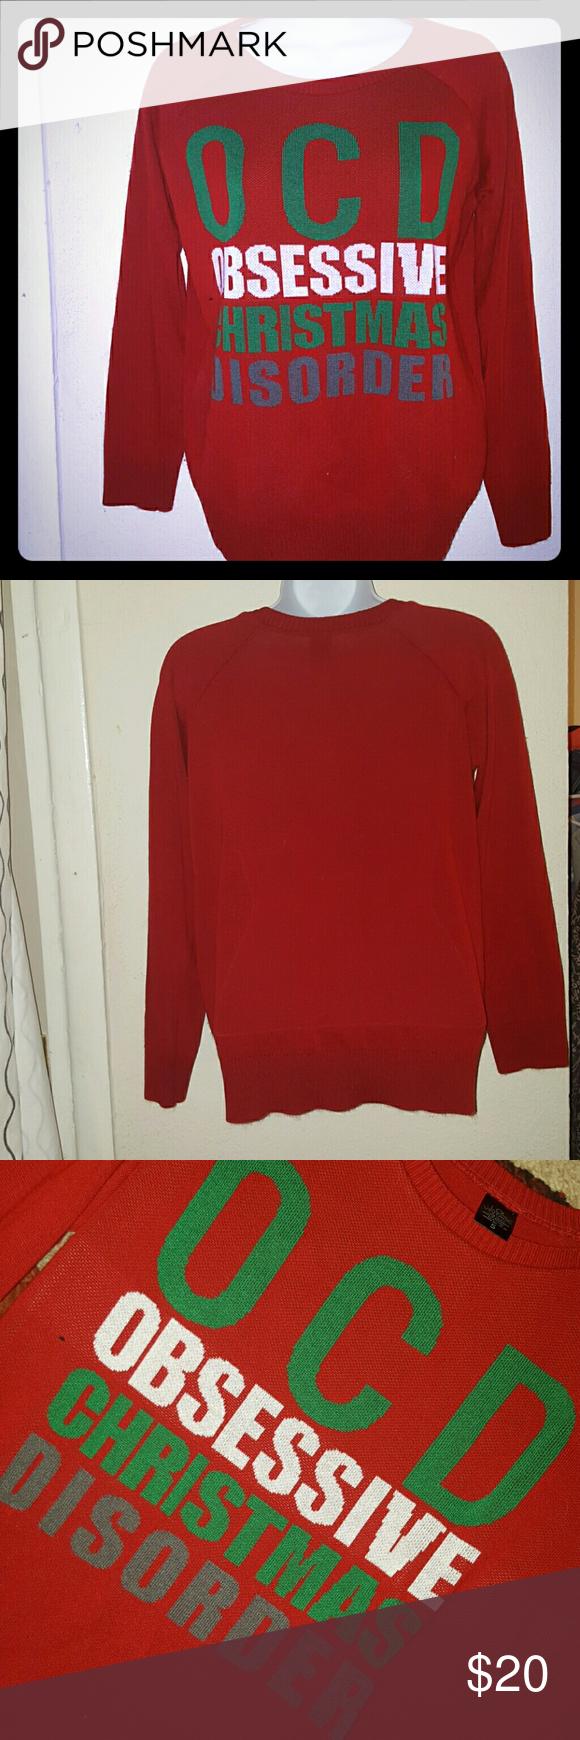 OCD Christmas Sweater Red festive sweater. OCD Obsessive Christmas ...